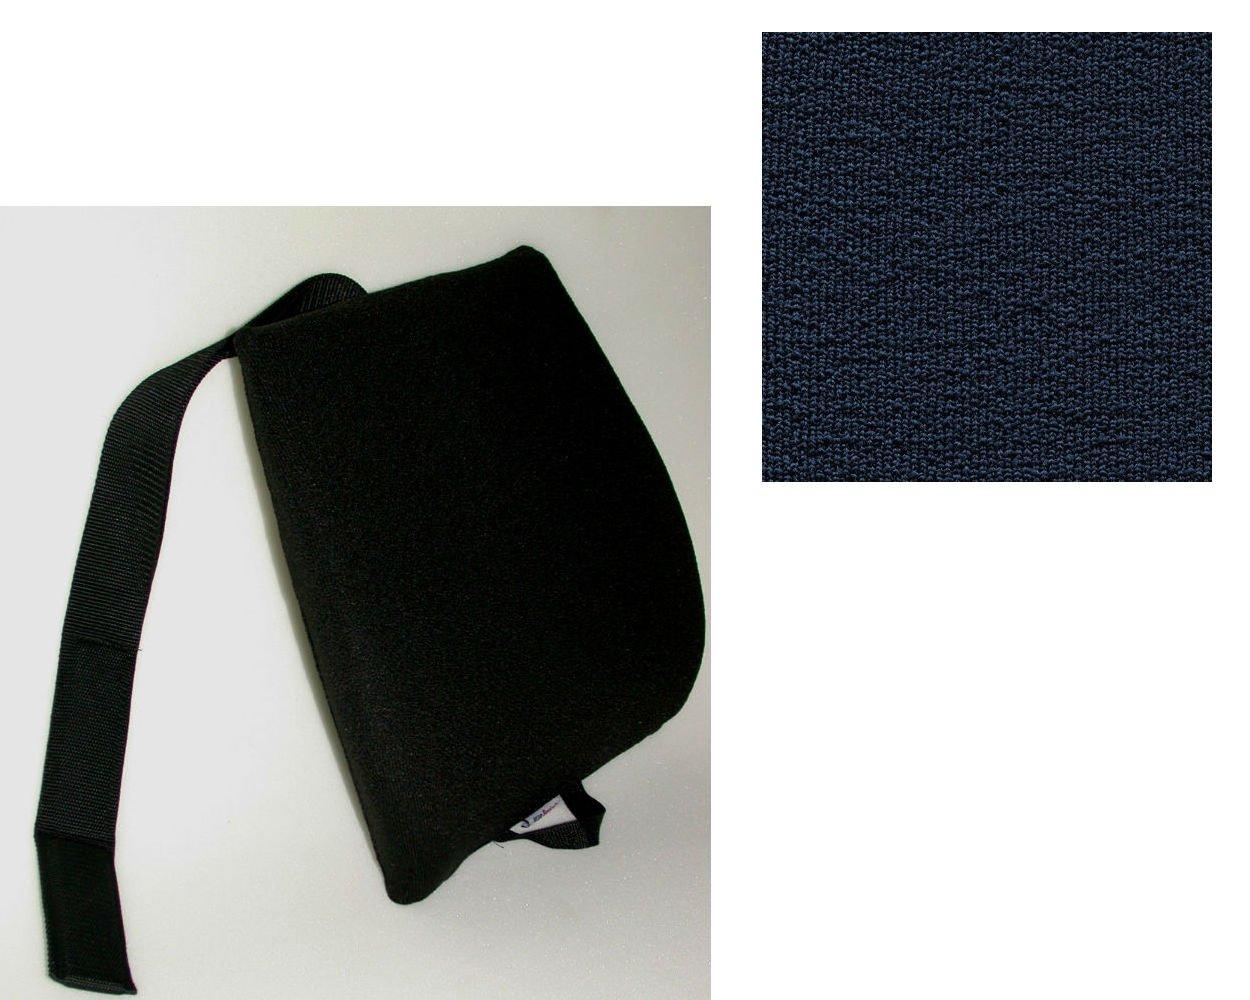 Mc Carty's Sacro-Ease Ergo Curve Cush Lumbar Support Cushion, Blue